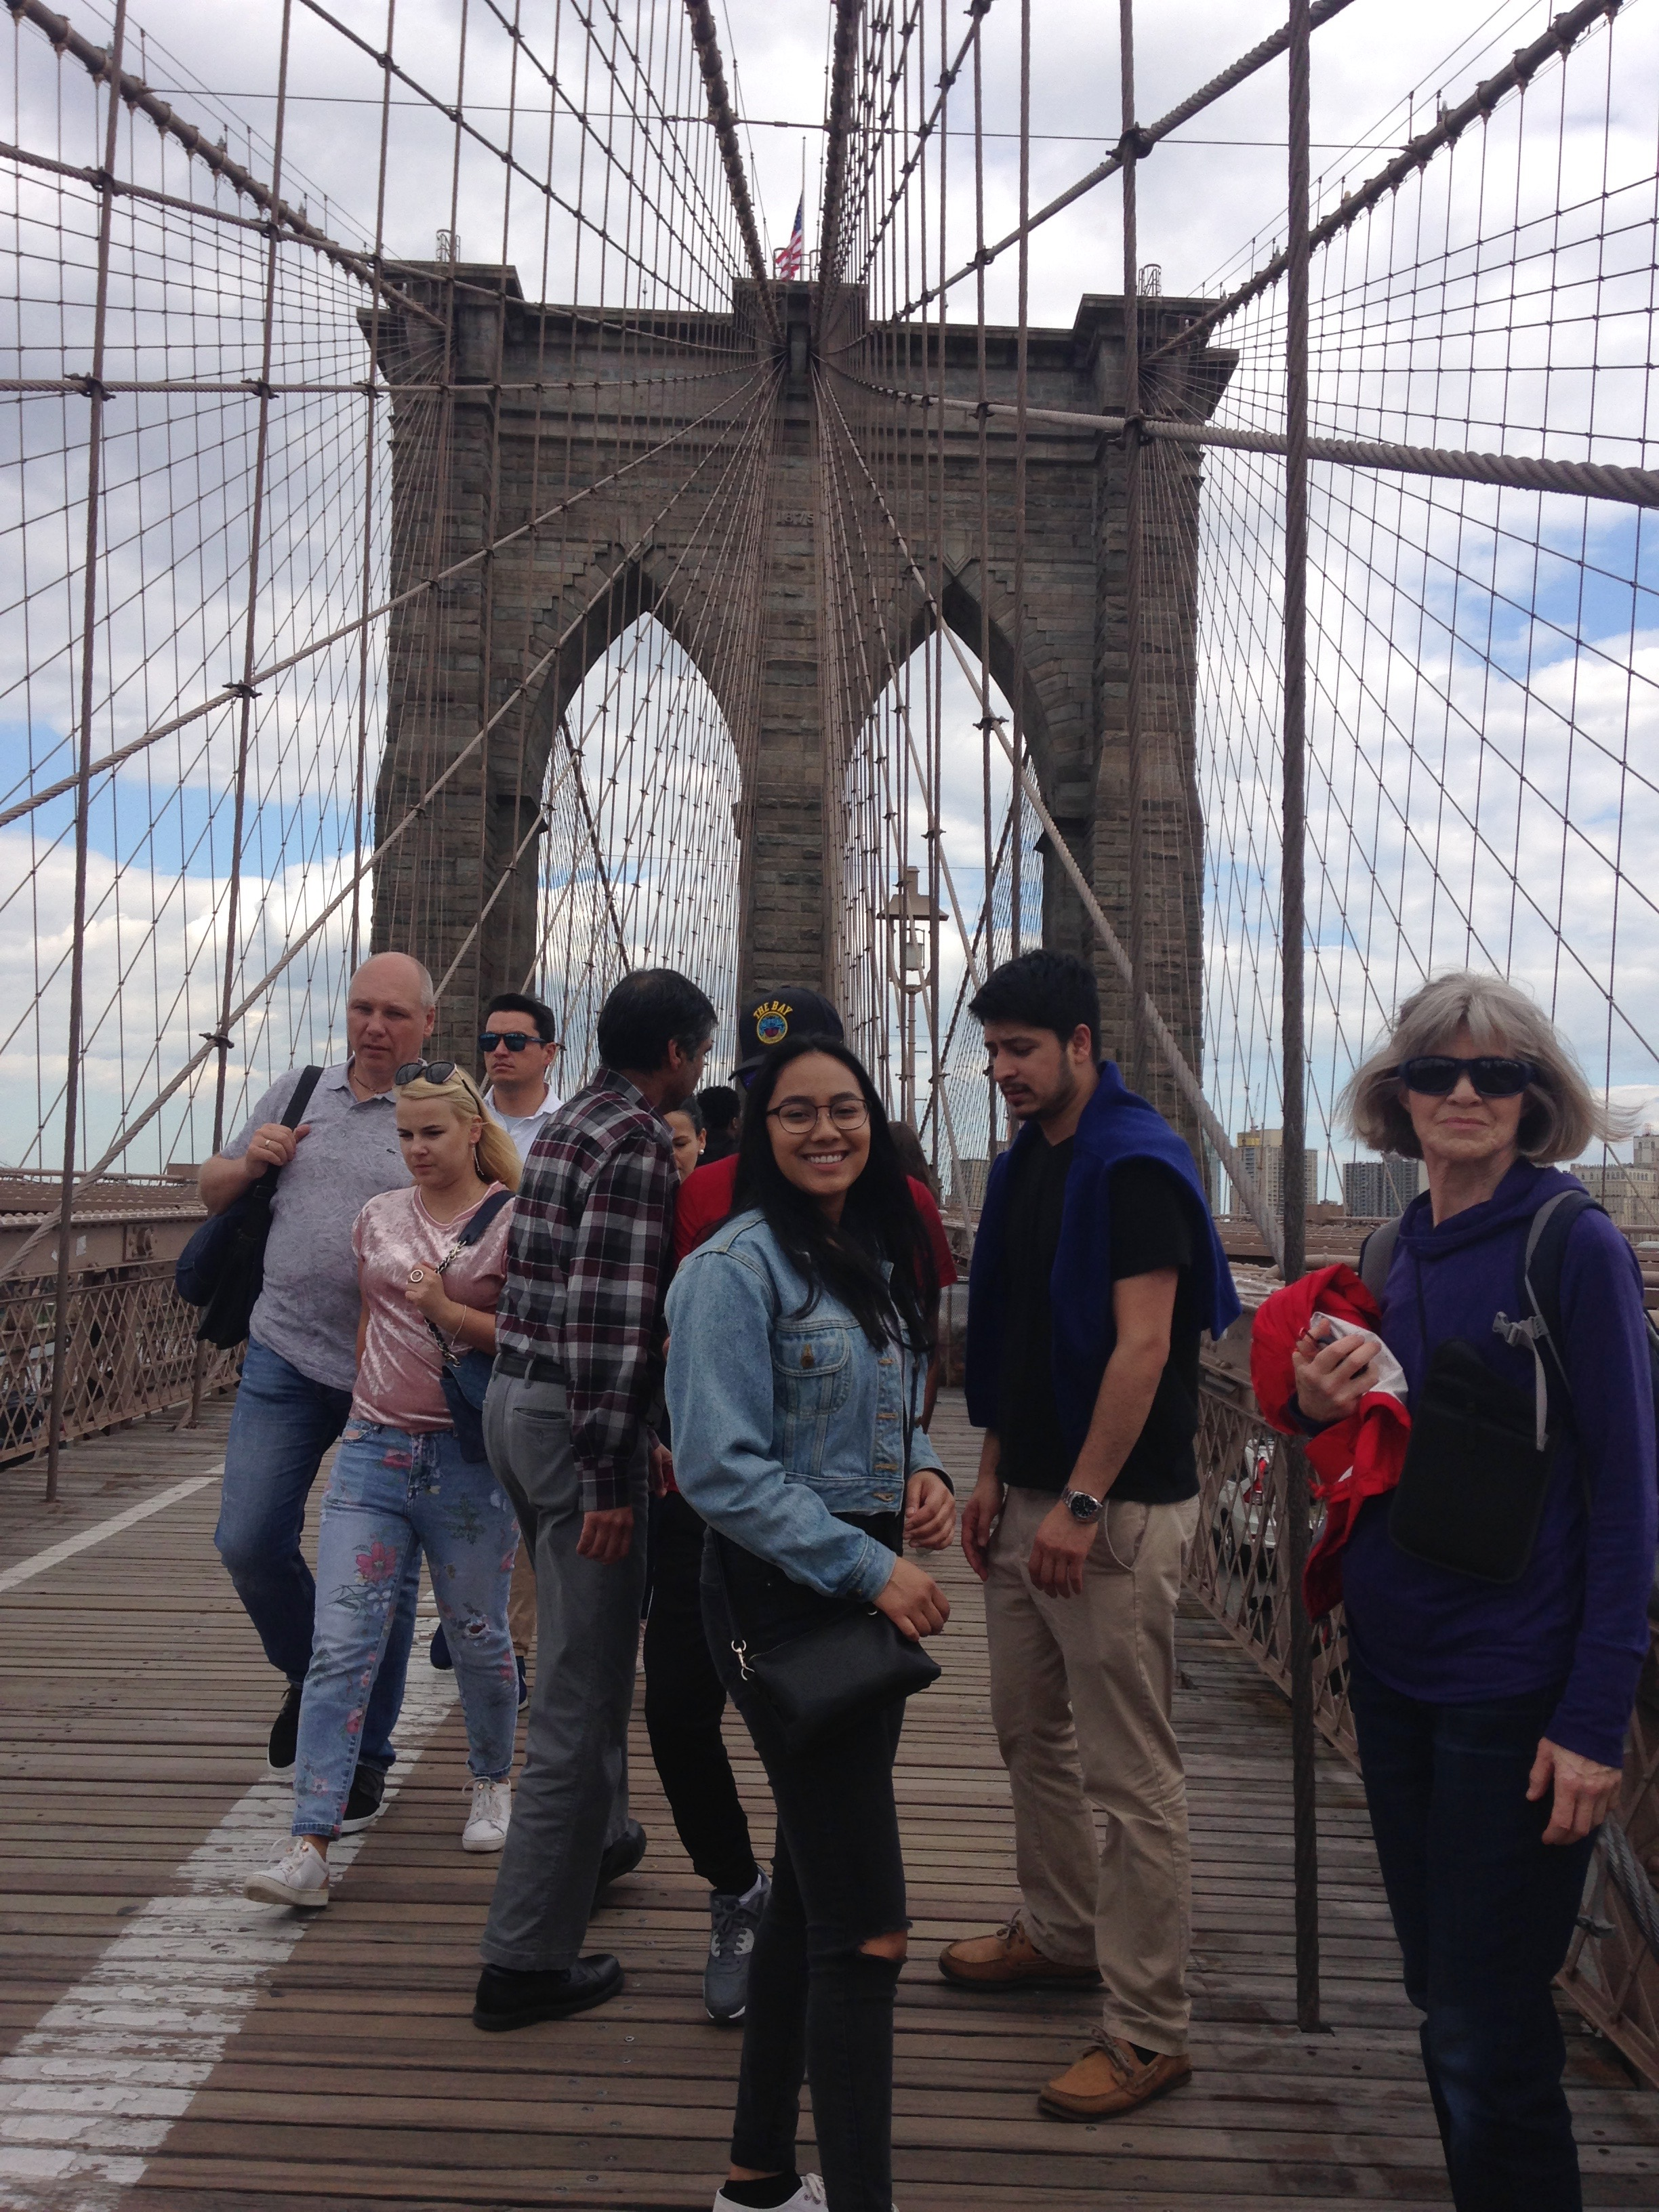 Tianna, The Brooklyn Bridge